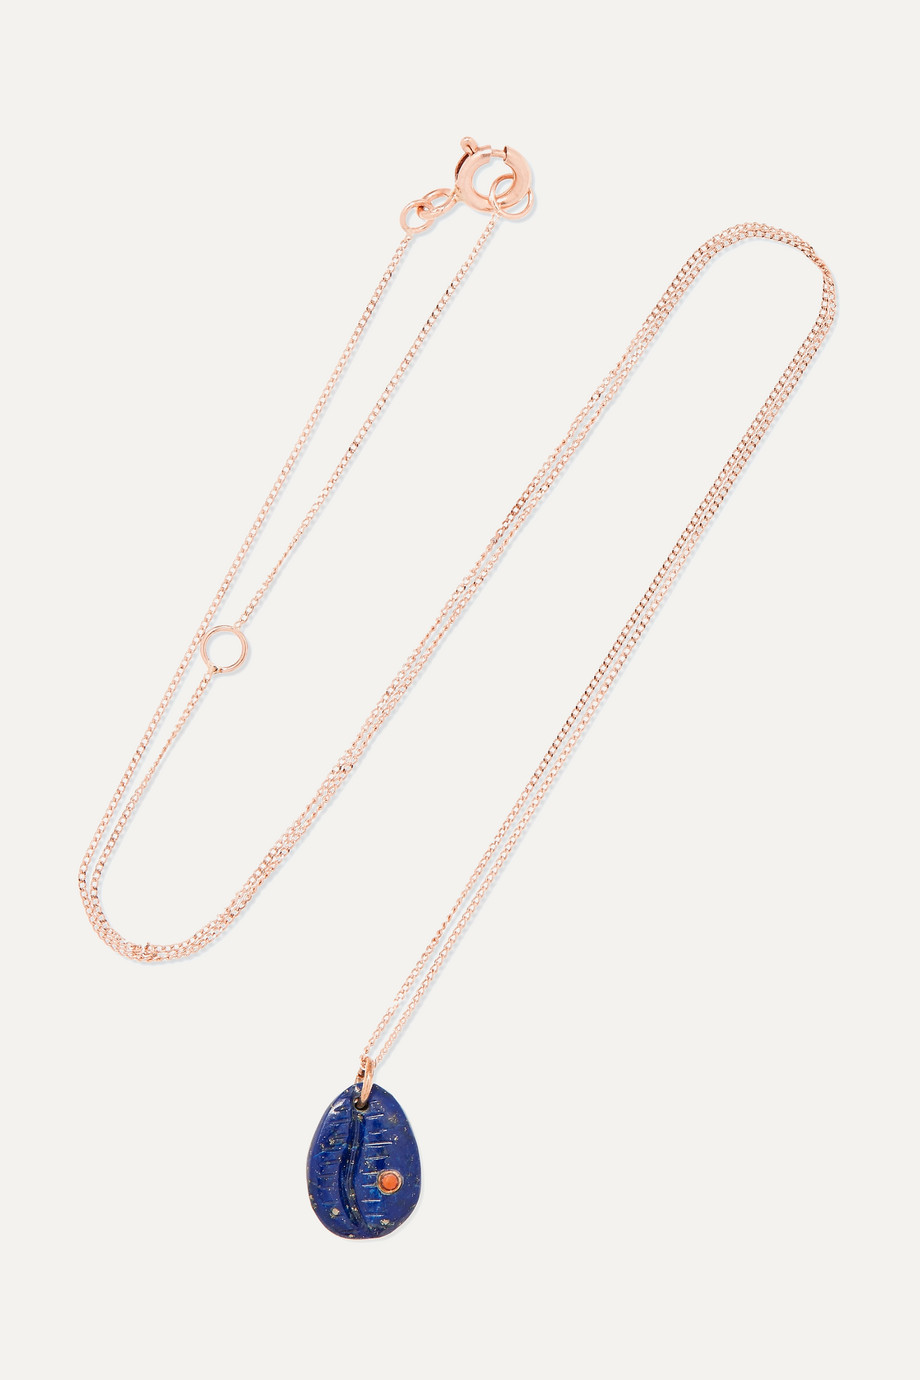 Pascale Monvoisin Cauri N°2 9-karat gold, lapis lazuli and faux coral necklace